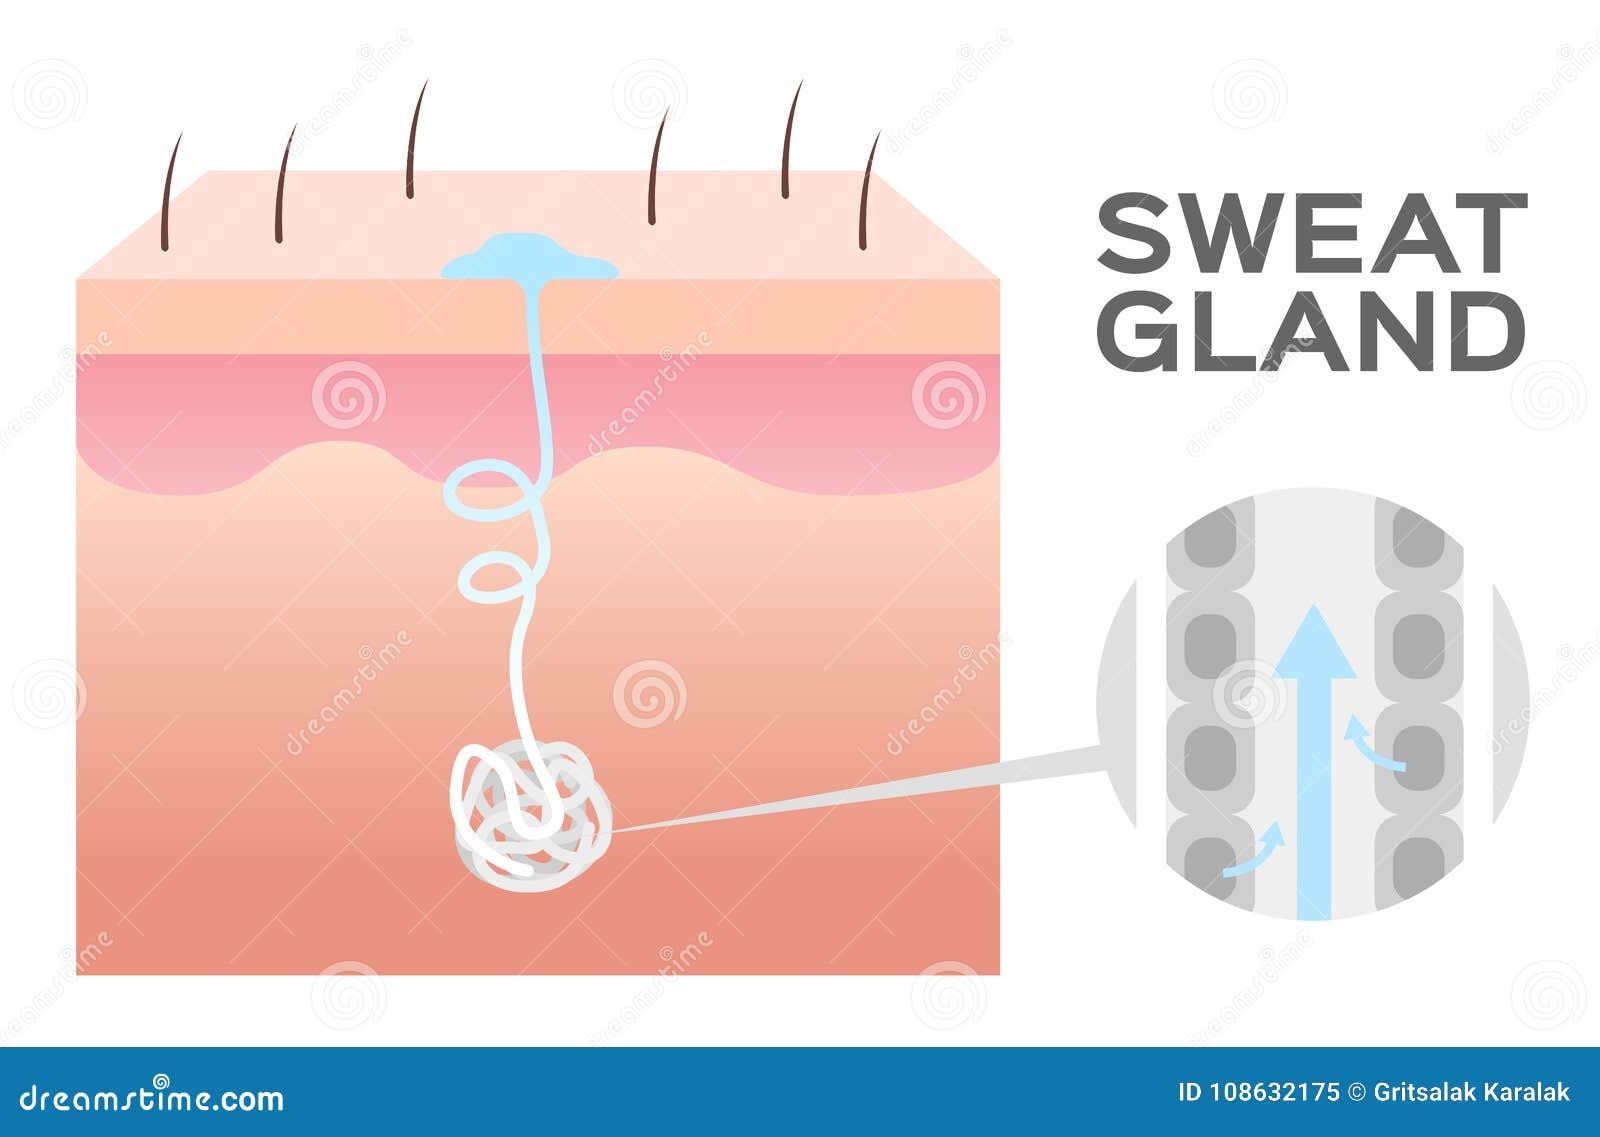 Skin Sweat Diagram Block And Schematic Diagrams